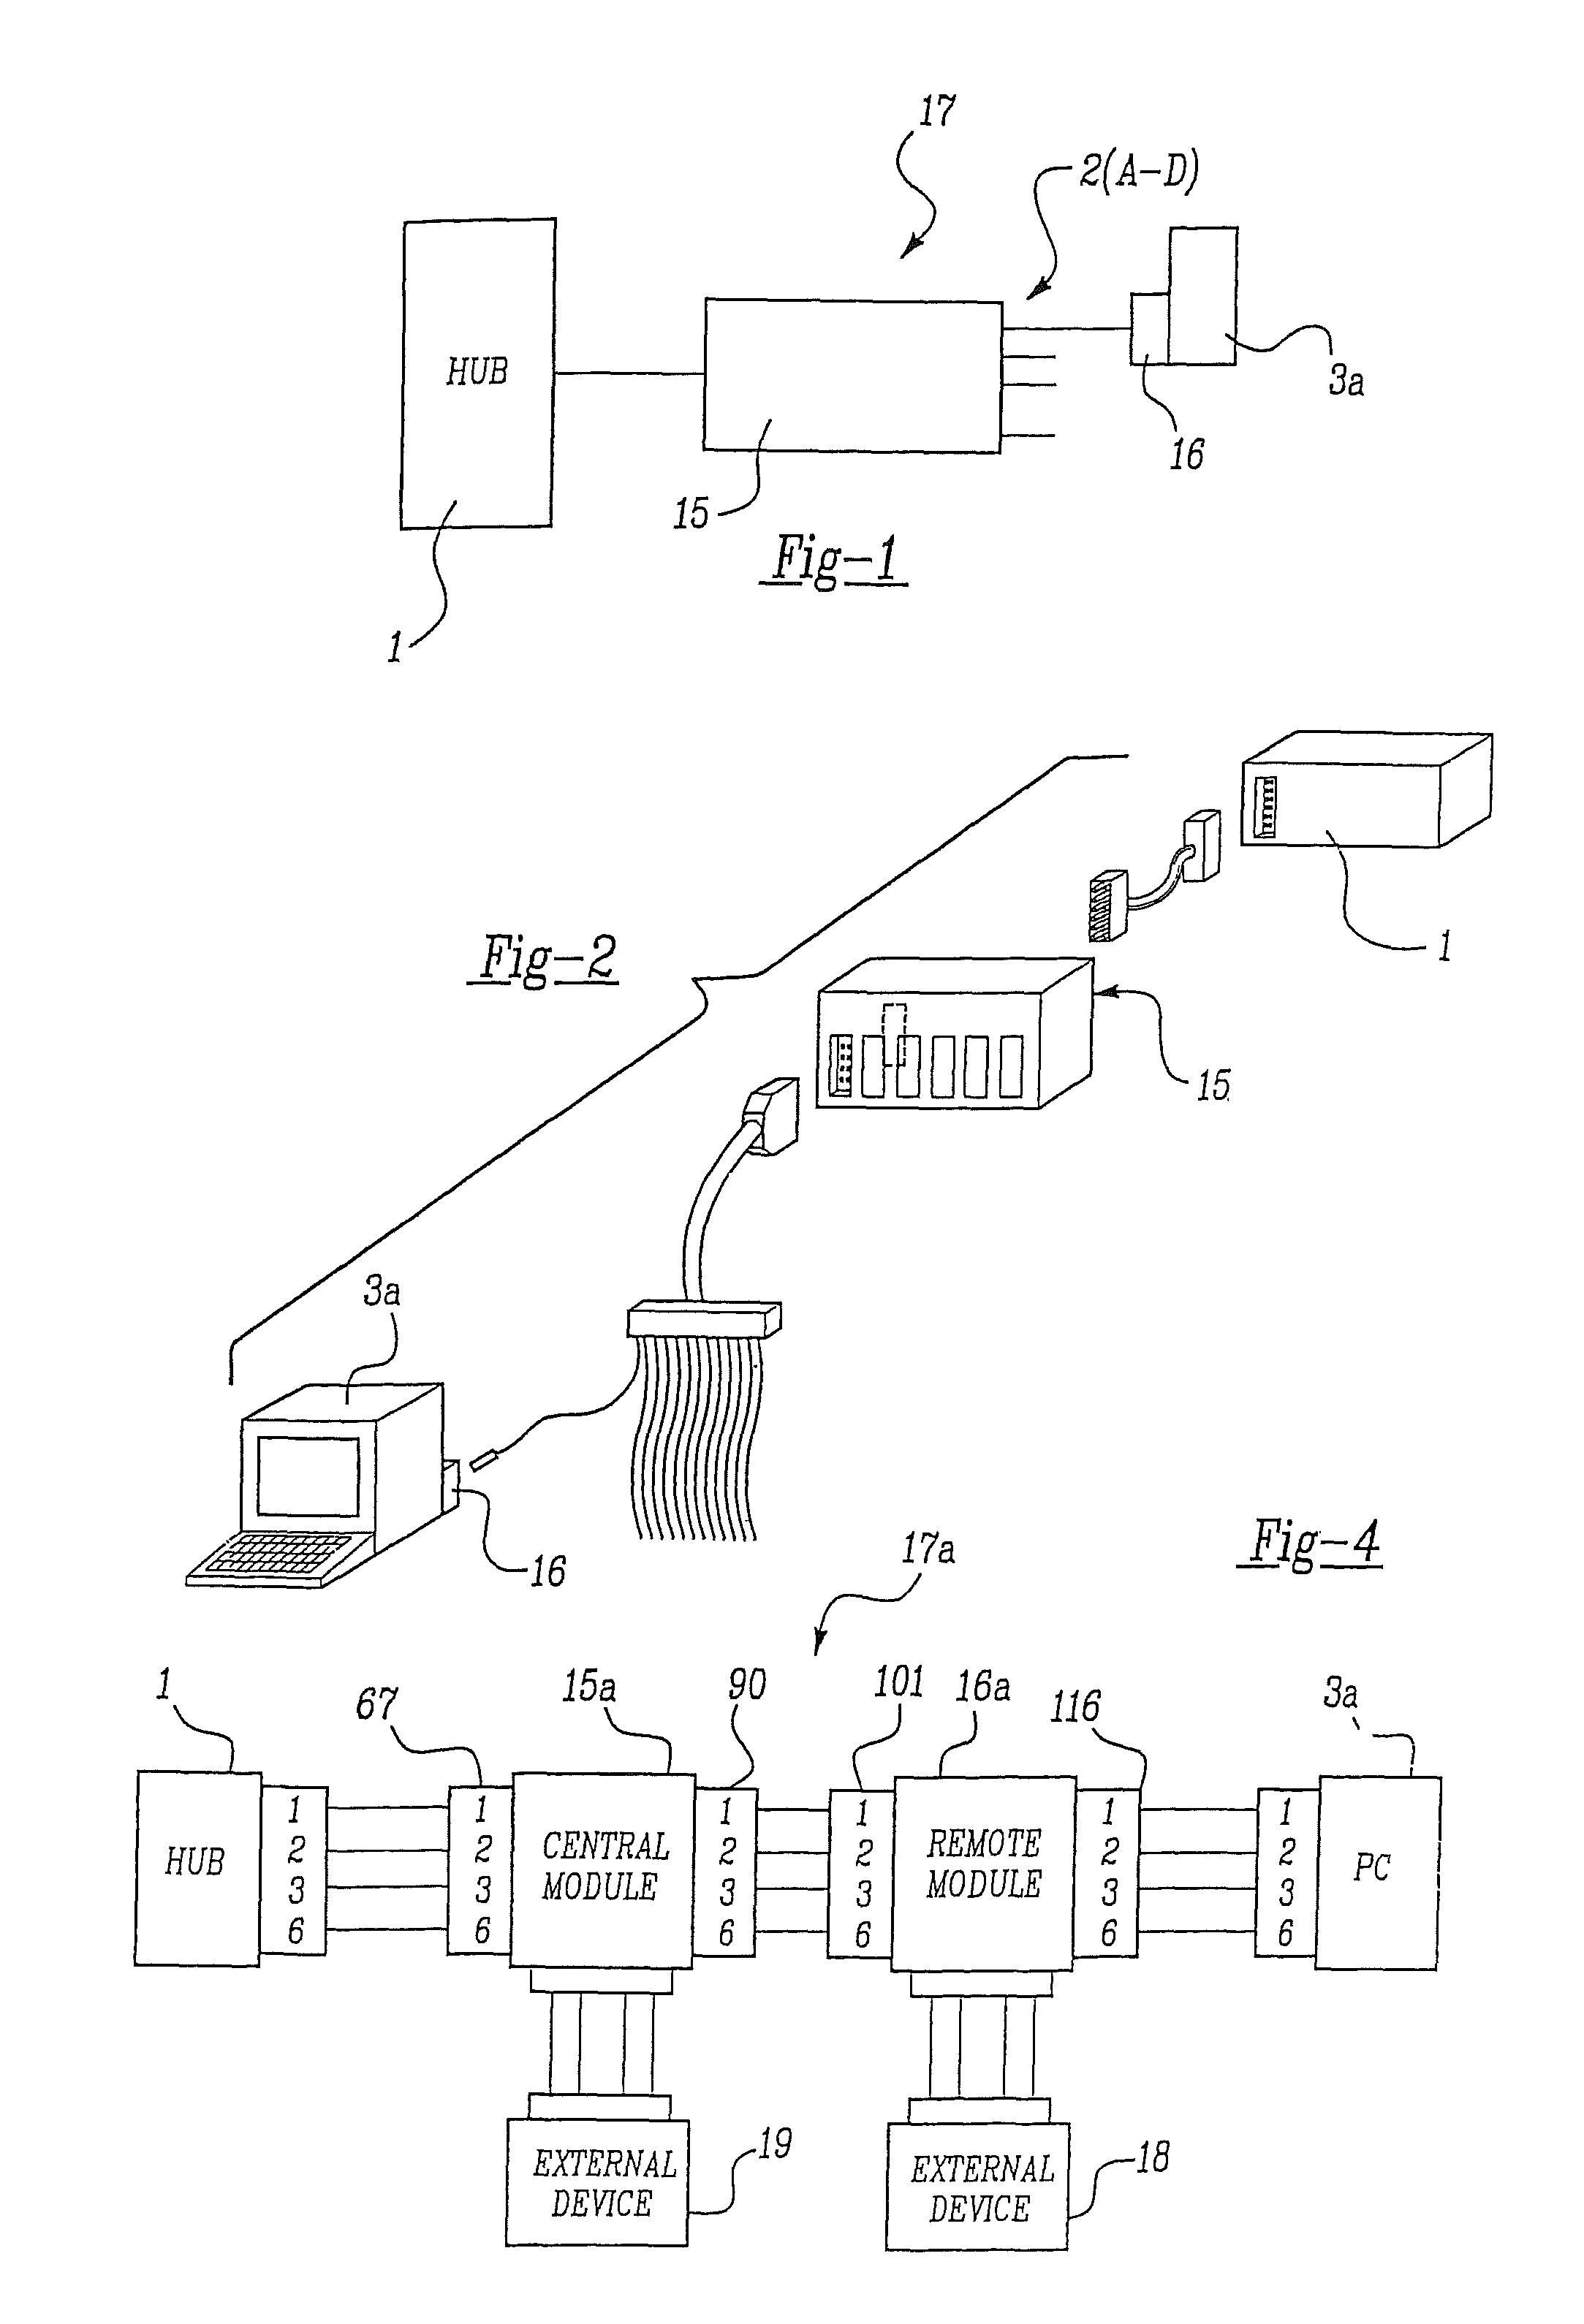 Patent Us 8155012 B2 Circuit Used On Cnc Cutting Machine Communicationcircuit Images